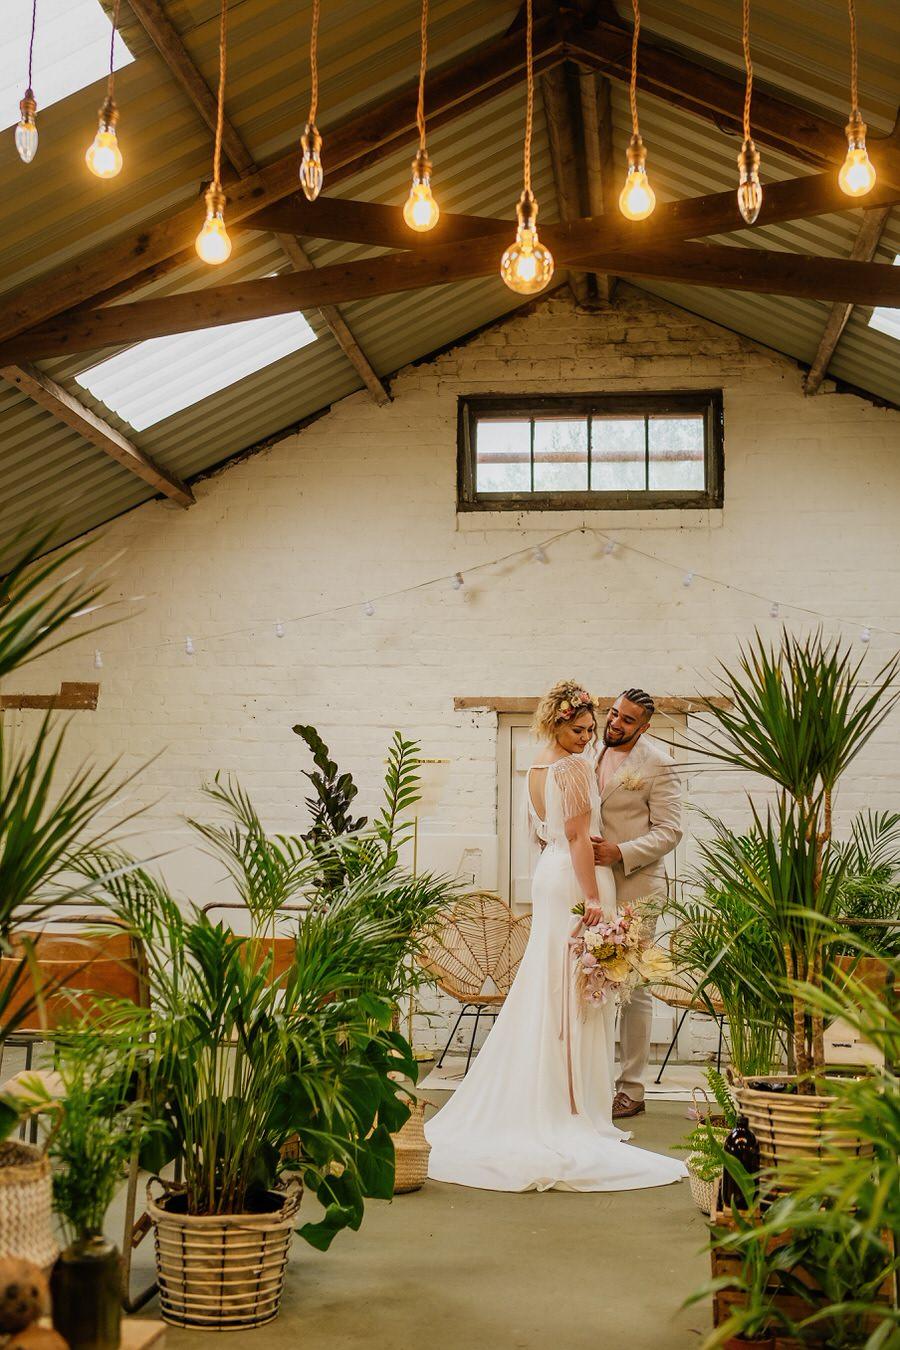 Free spirited modern jungle wedding inspiration at White Syke Fields, image credit Jenna Kathleen Photography (17)